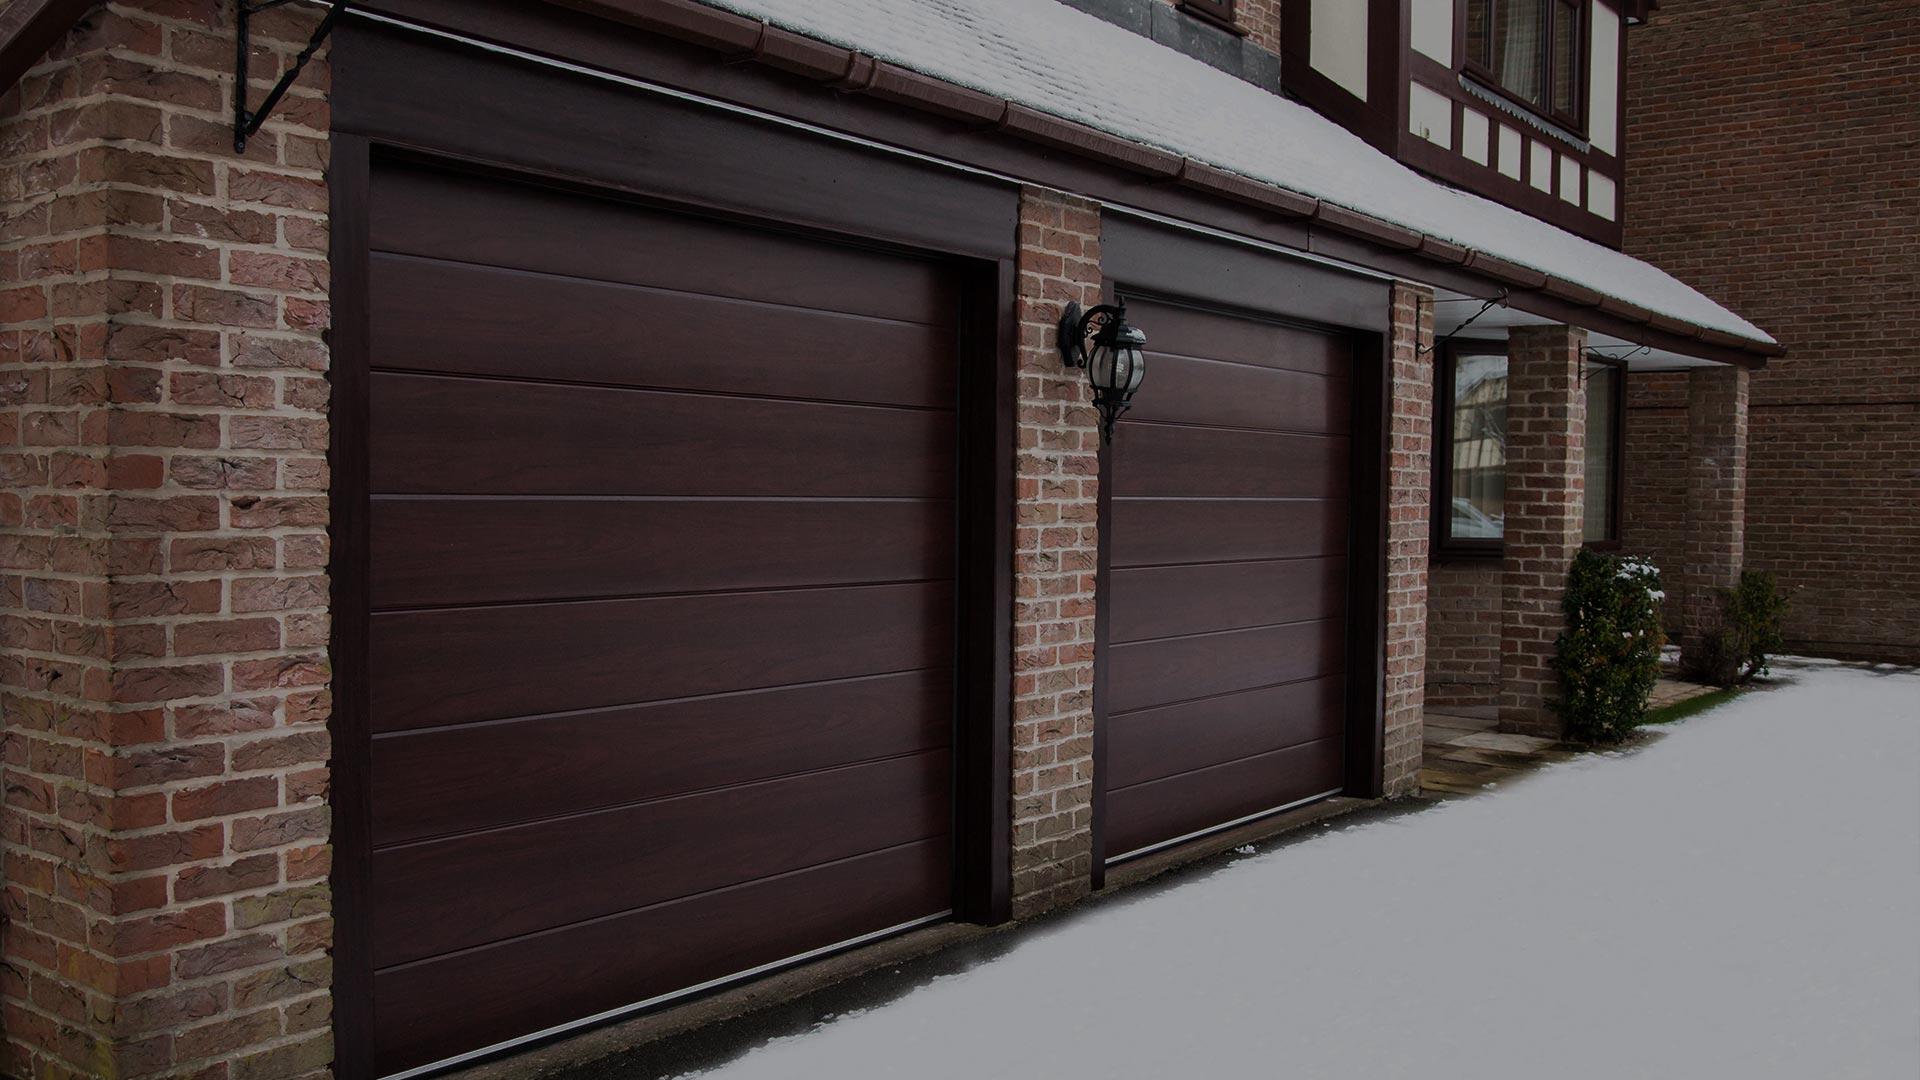 Finestre porte tende serramenti infissi grate - Tende per porte esterne ...